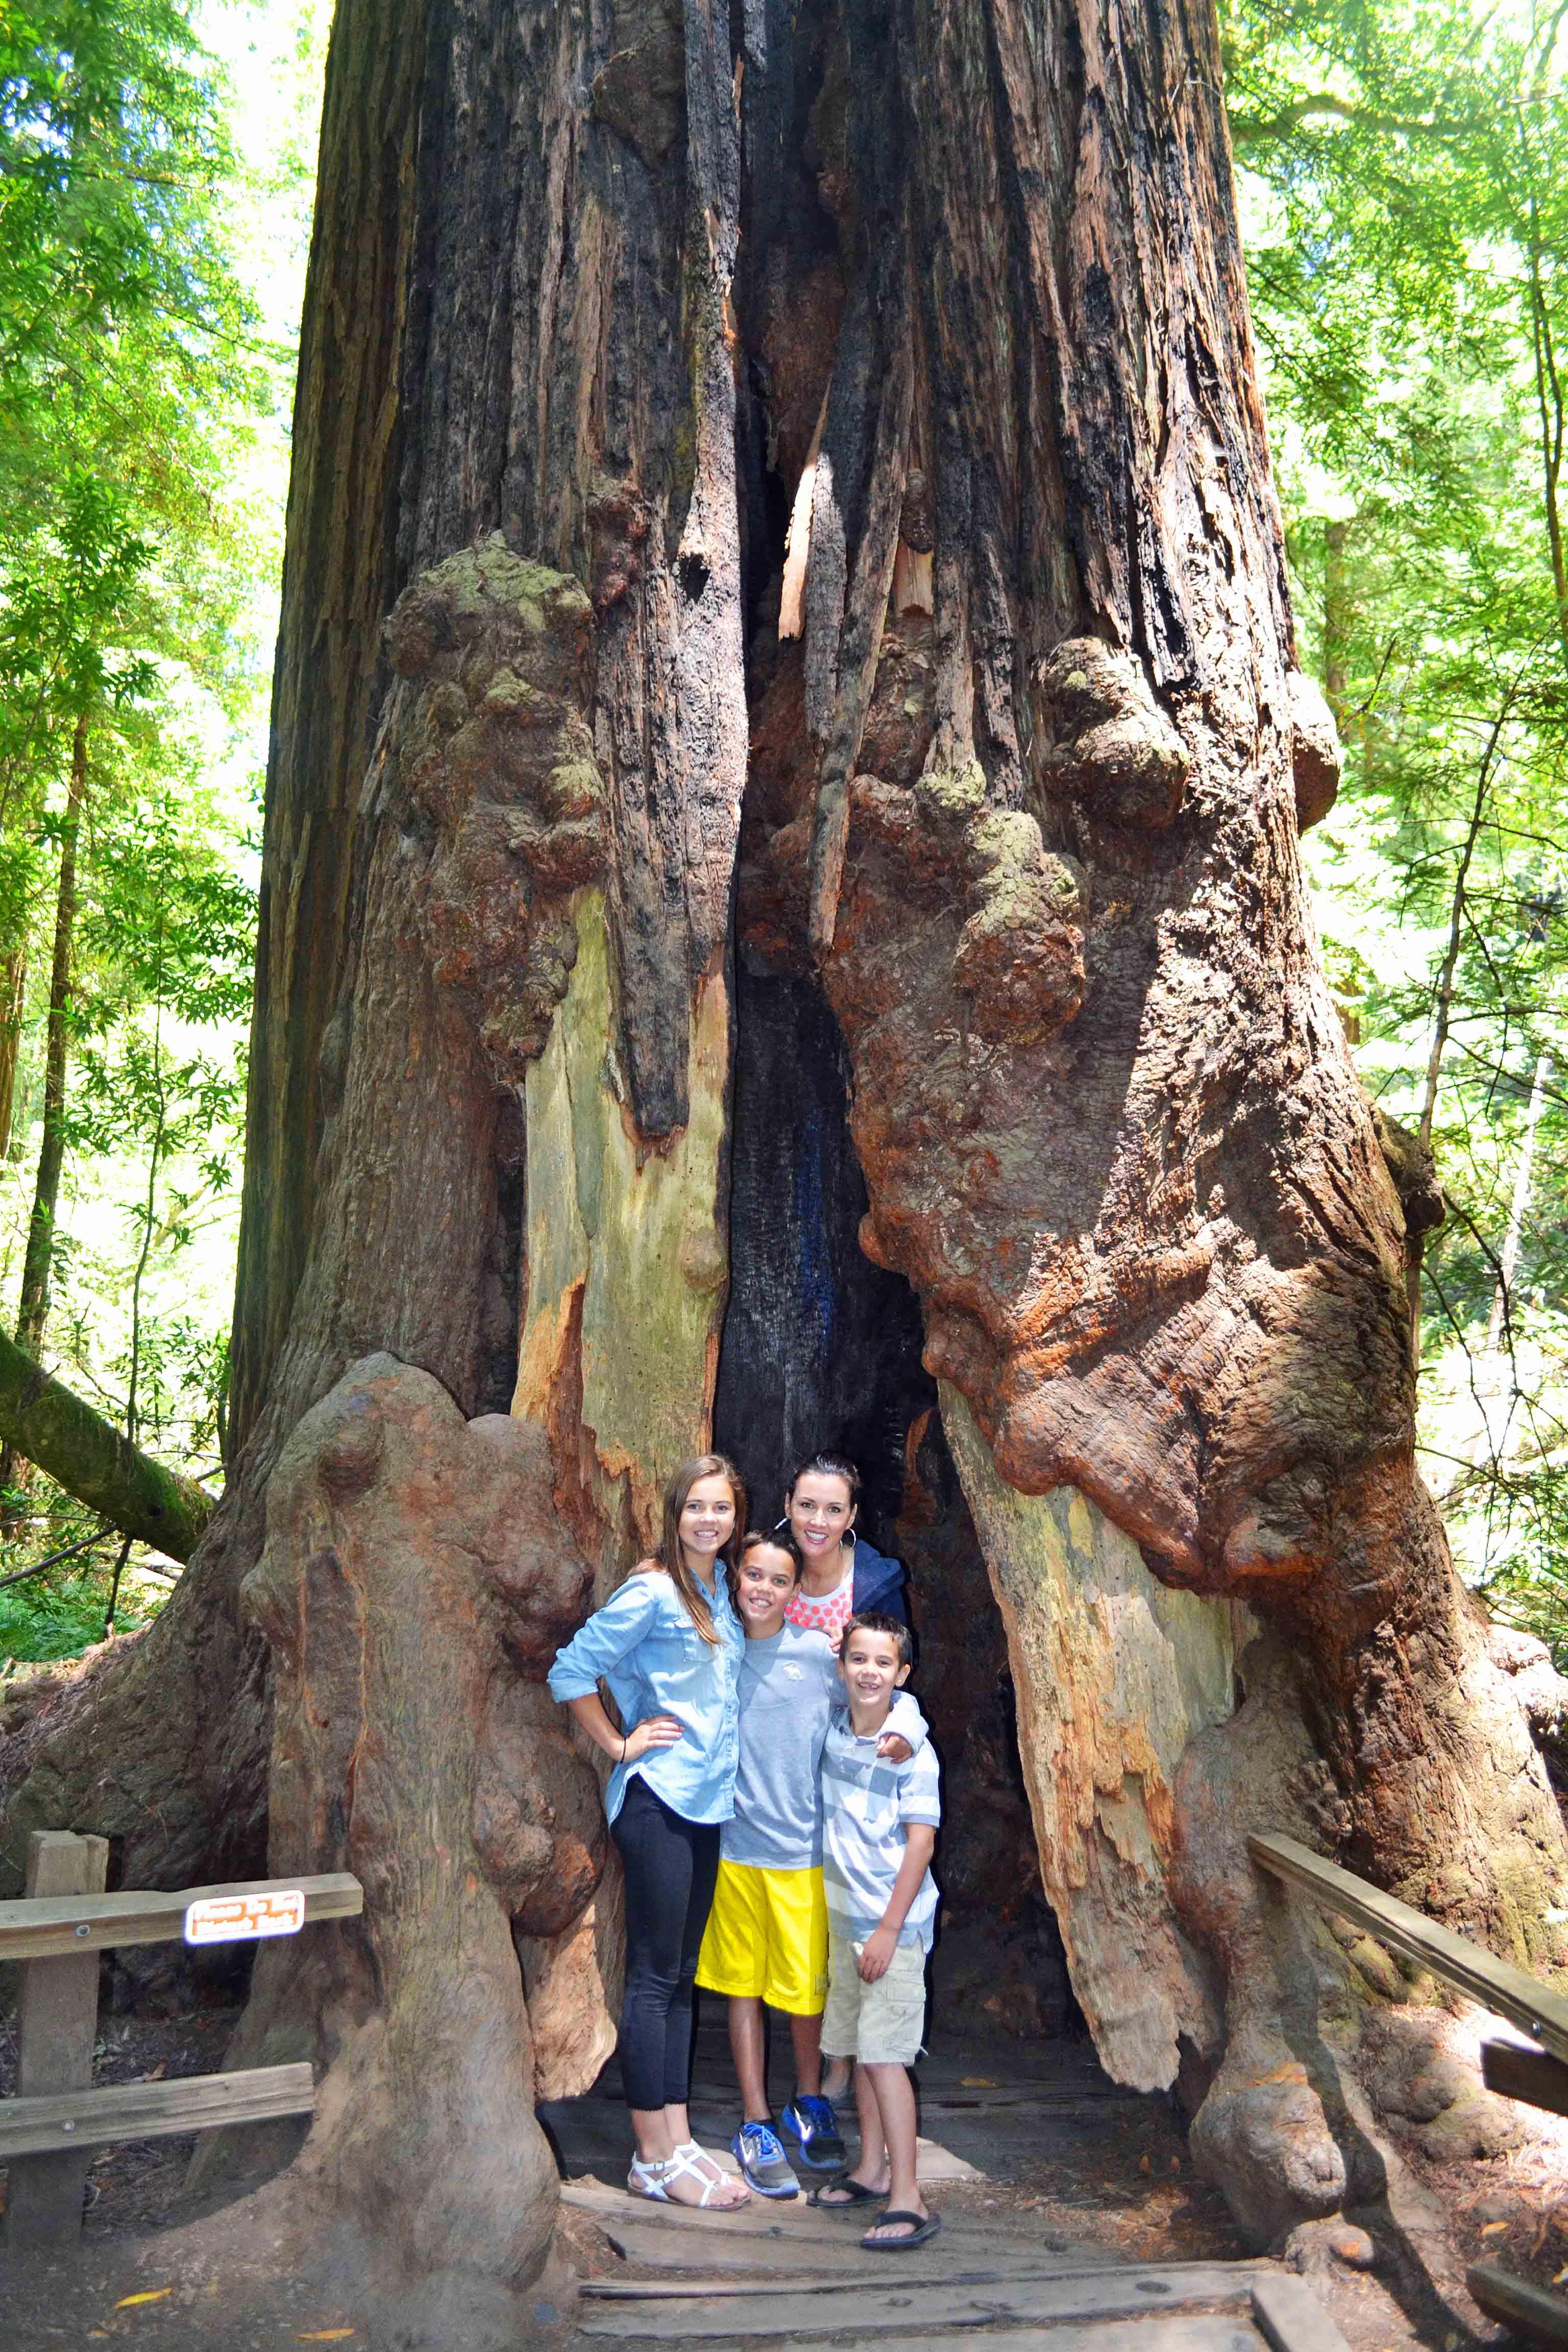 Muir Woods California Pacific Highway 1 Road Trip Guide